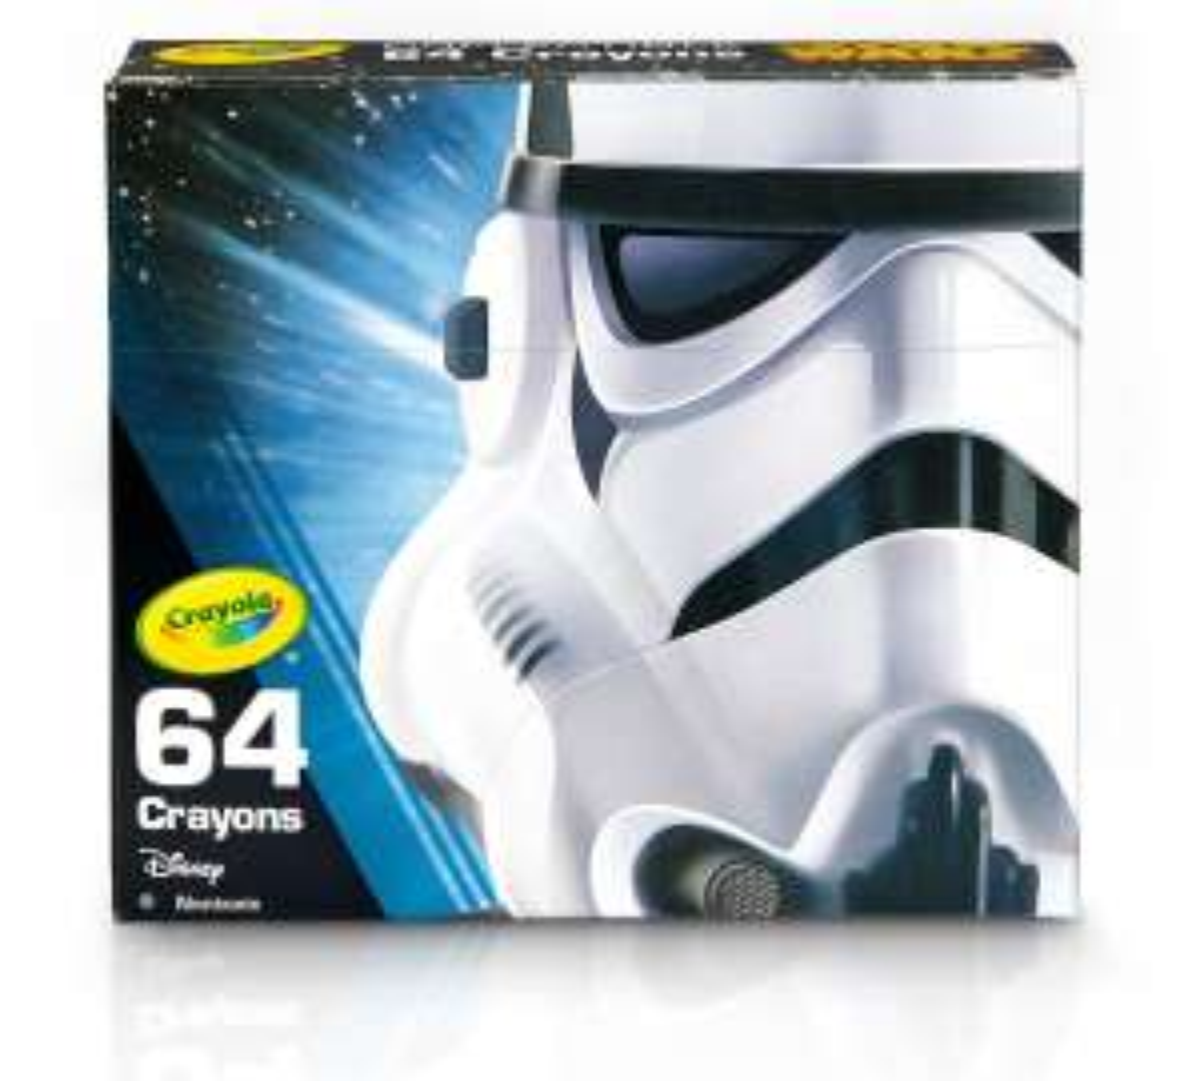 Crayola Stormtrooper Star Wars 64 Crayon Set £1.74 C+C with code @ Ryman